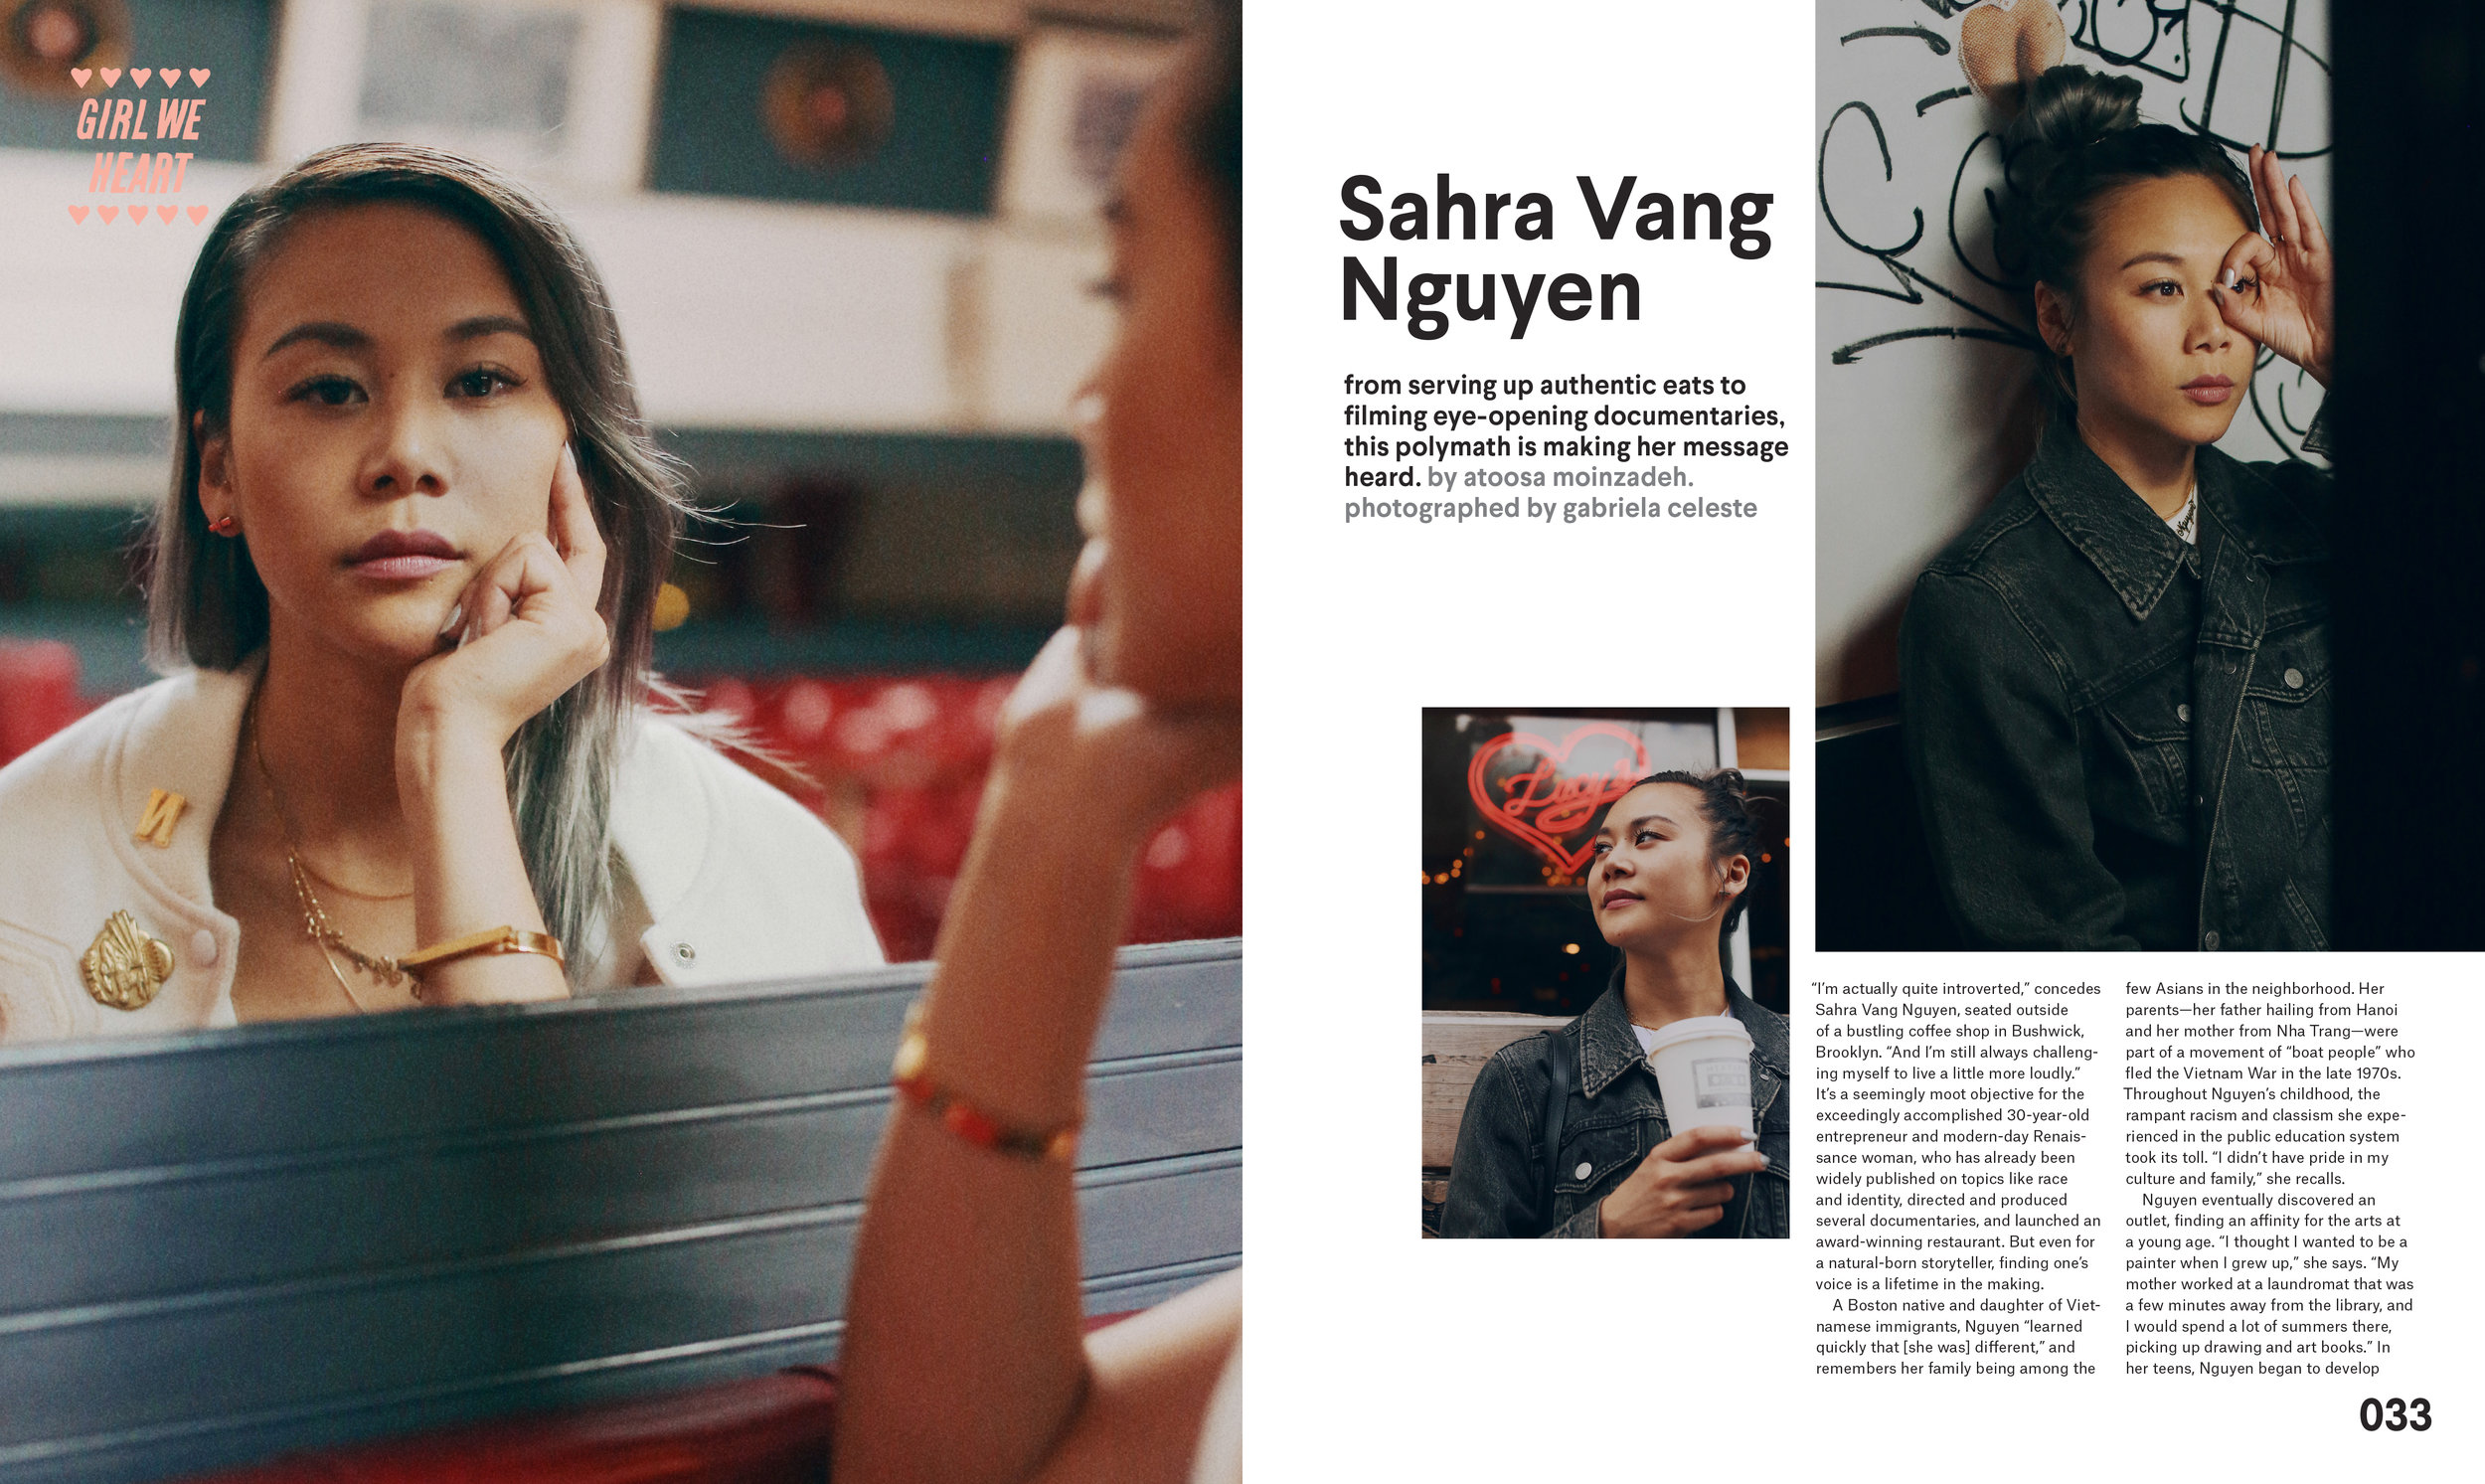 sahra vang nguyen nylon magazine spread